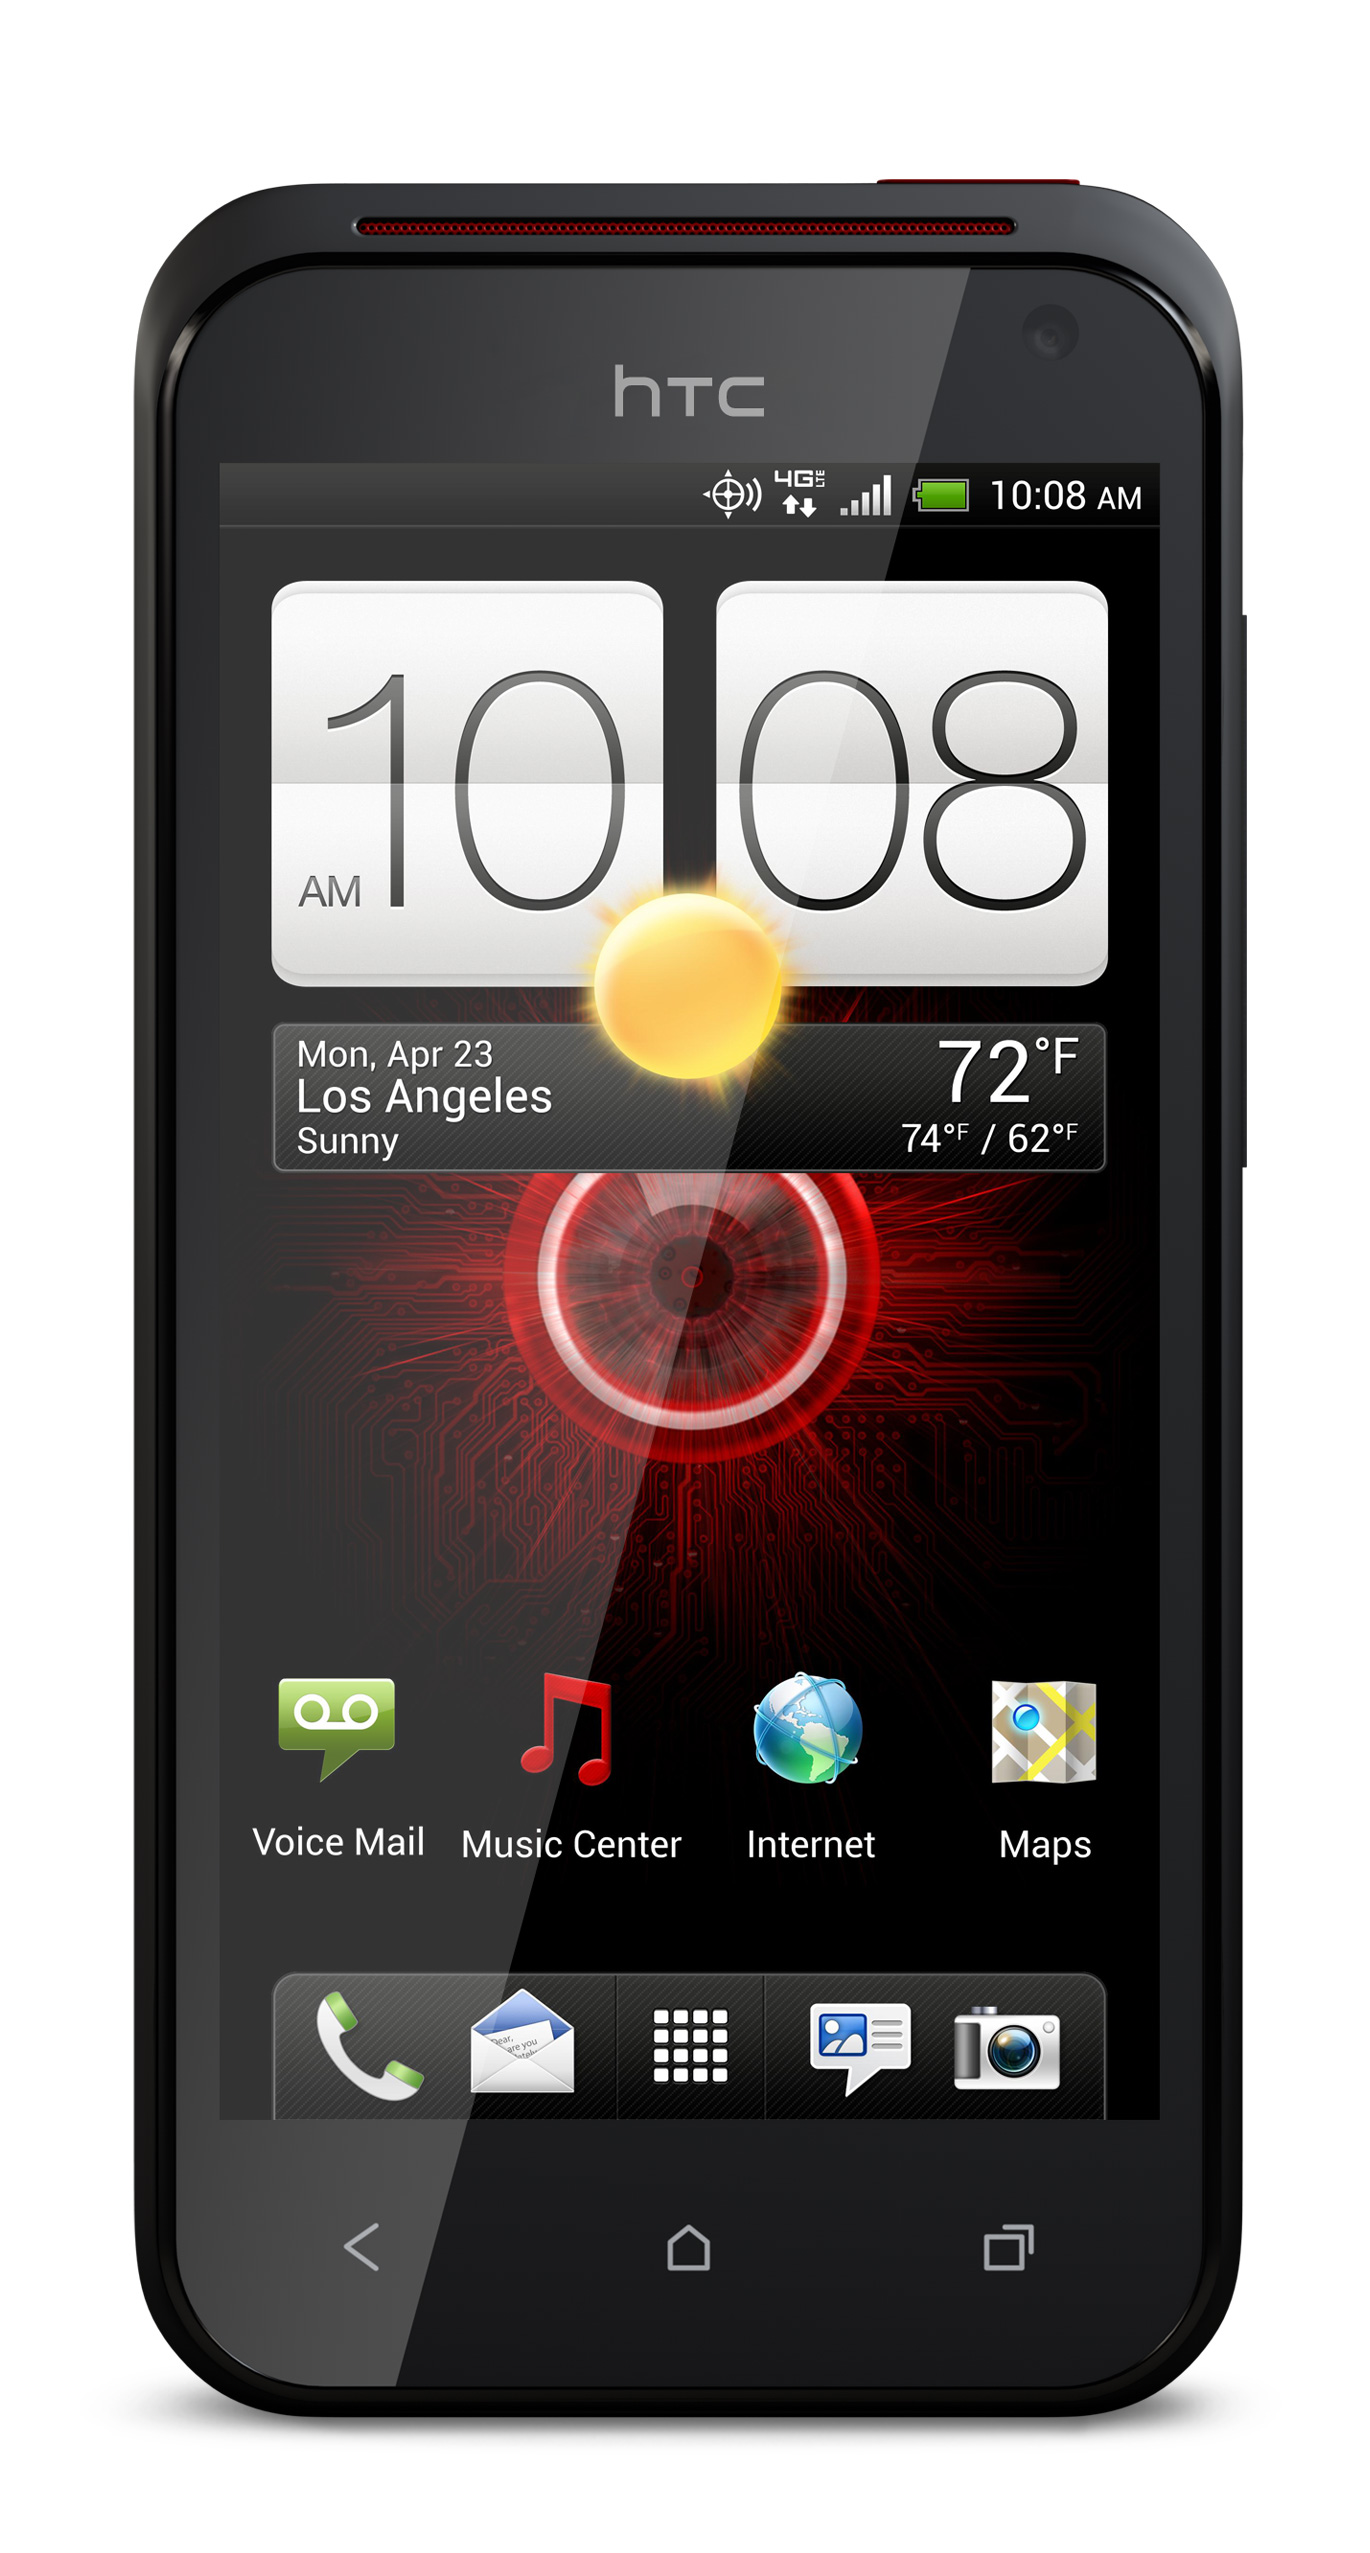 HTC Incredible 4G LTE Design Information